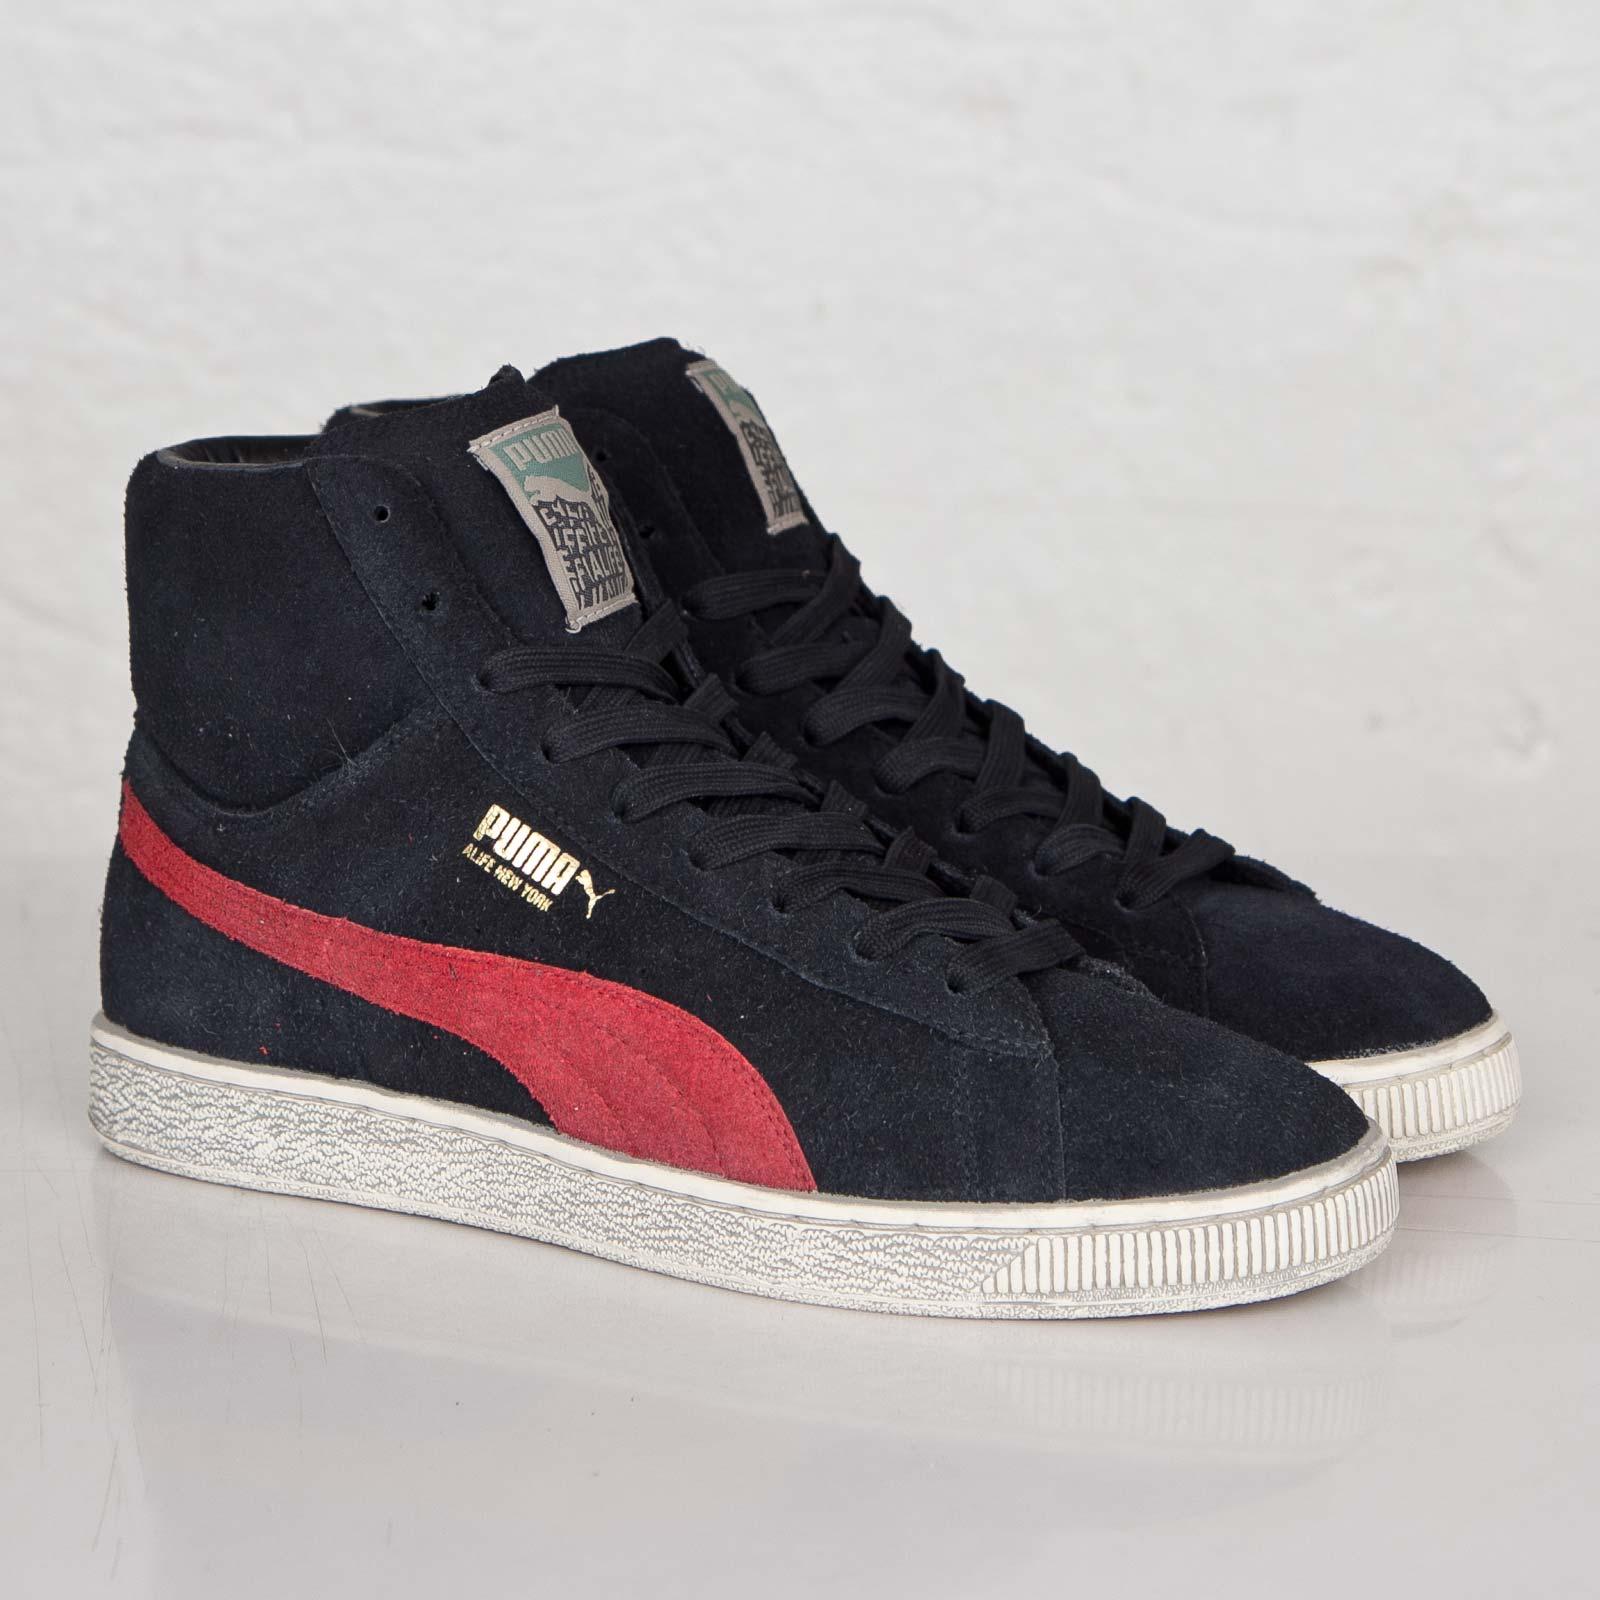 bb909f9c3aa Puma Suede Mid x ALIFE - 358507-01 - Sneakersnstuff